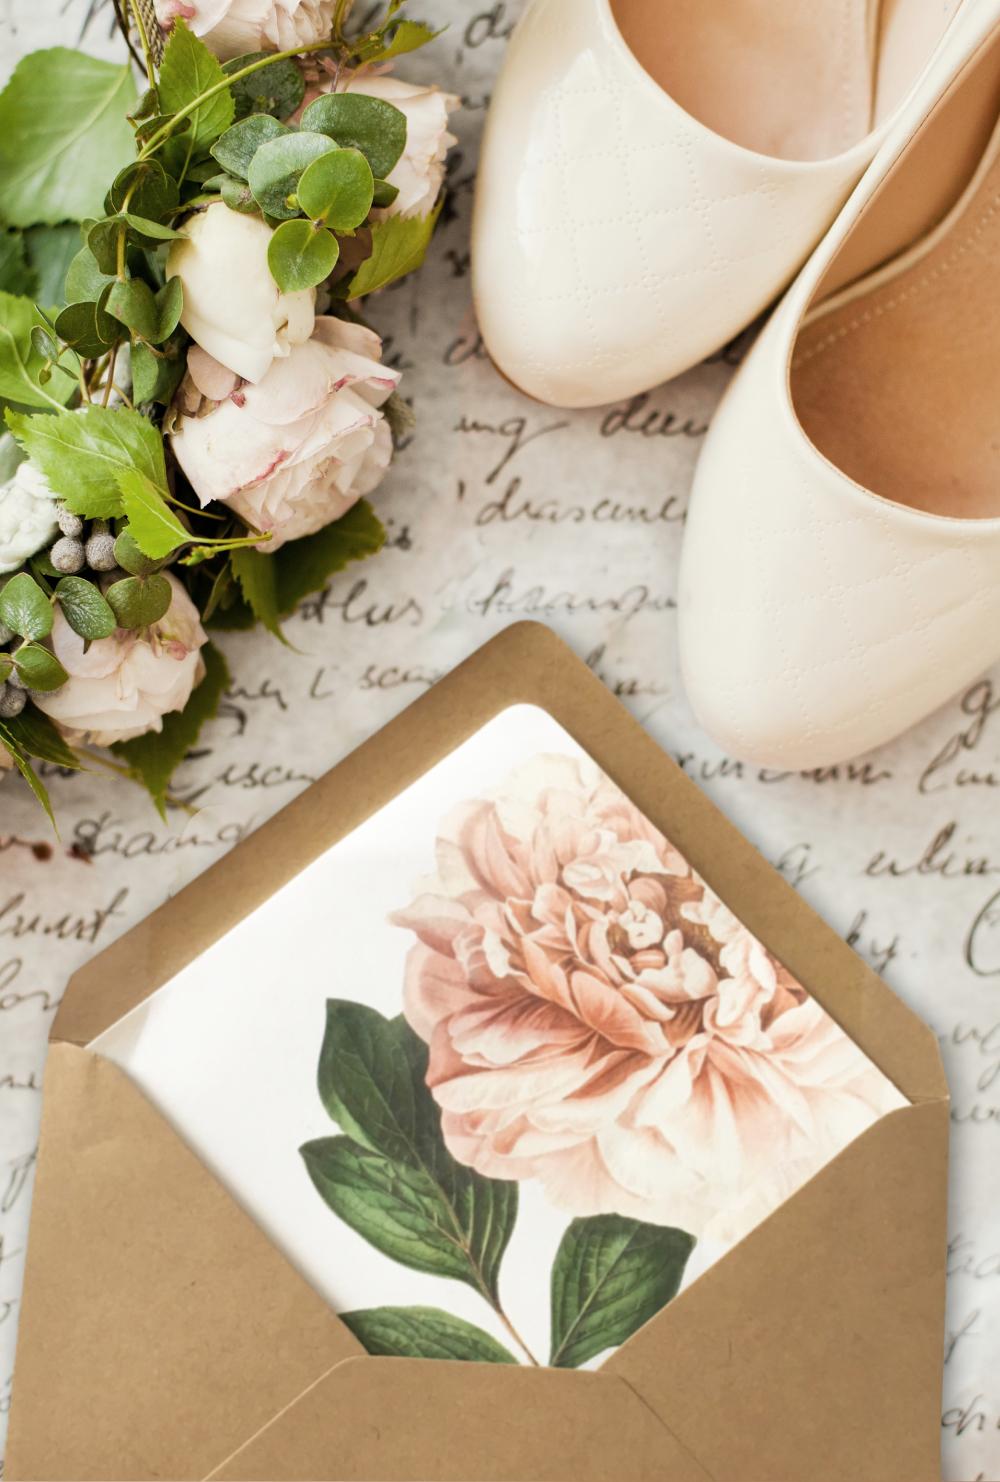 peach-peony-wedding-invitation-kraft-paper-envelope-liner-.jpg